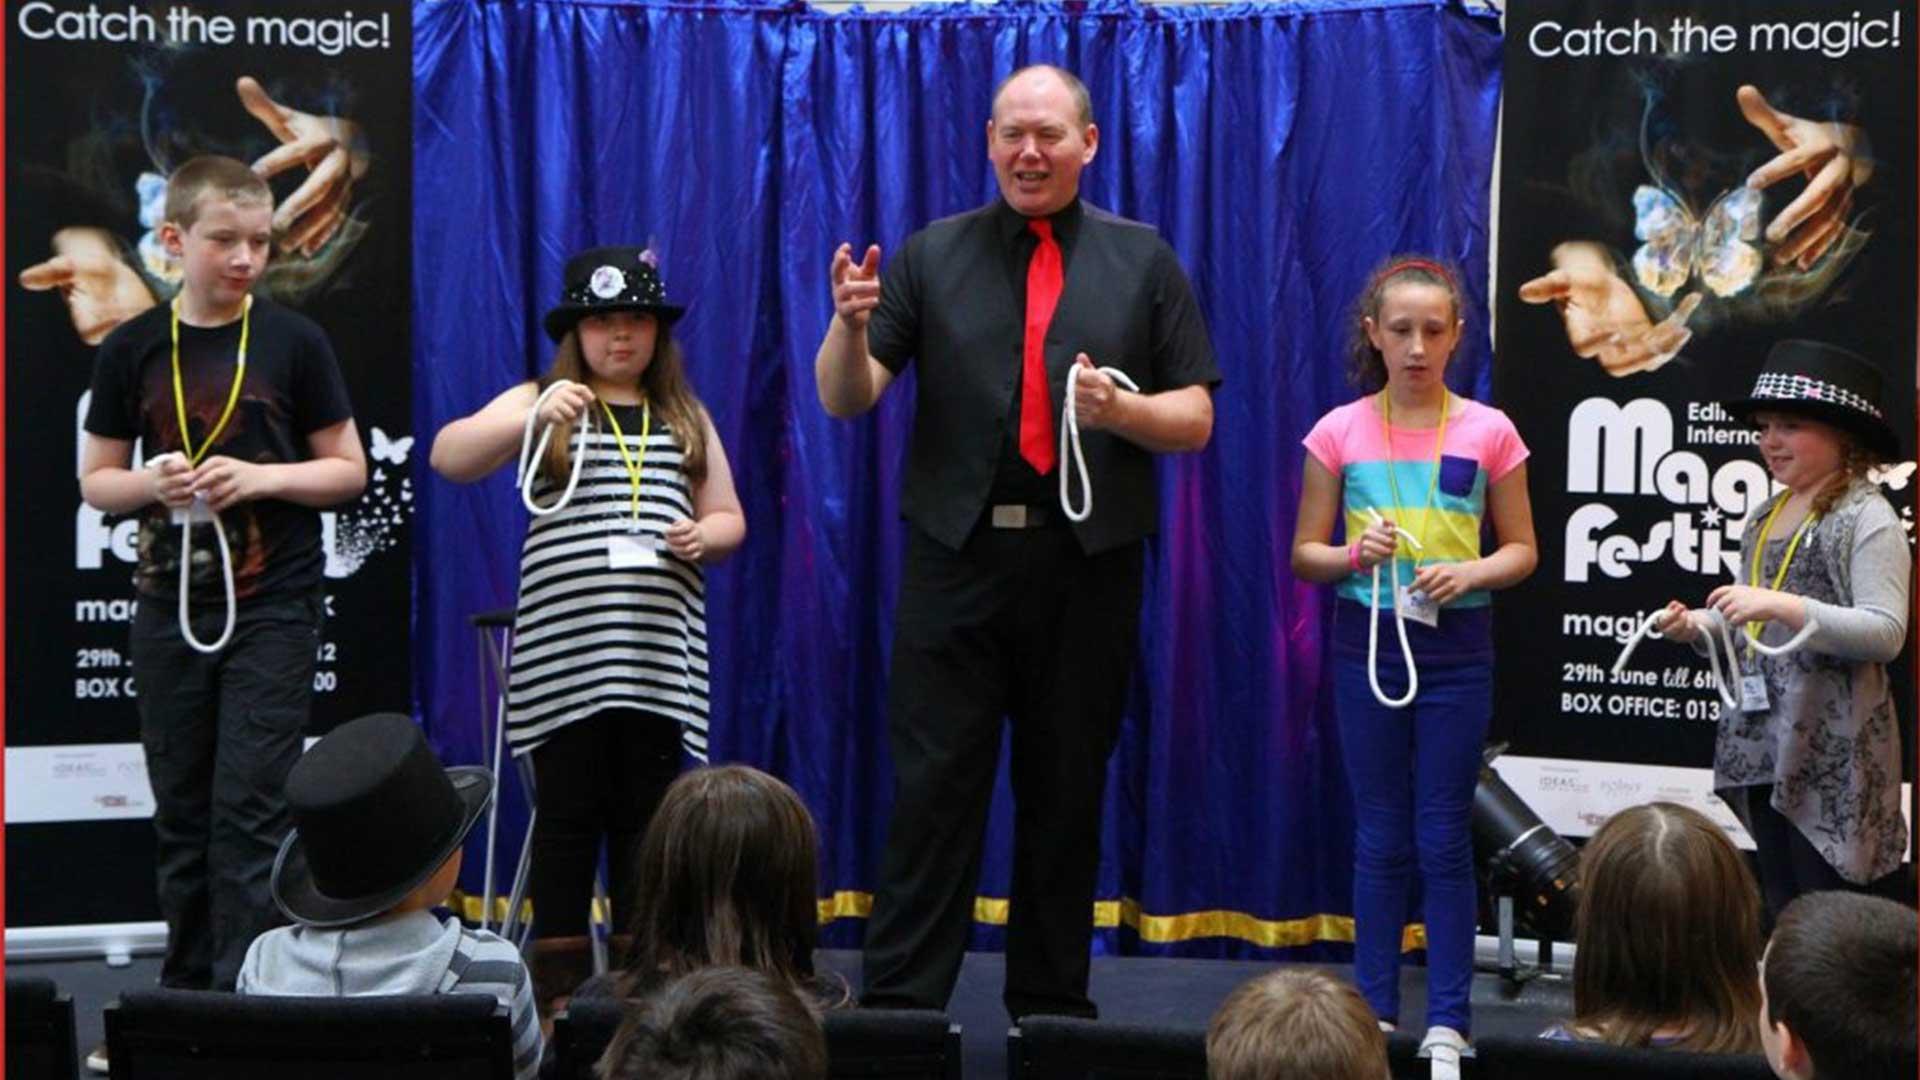 Kids Magician Edinburgh